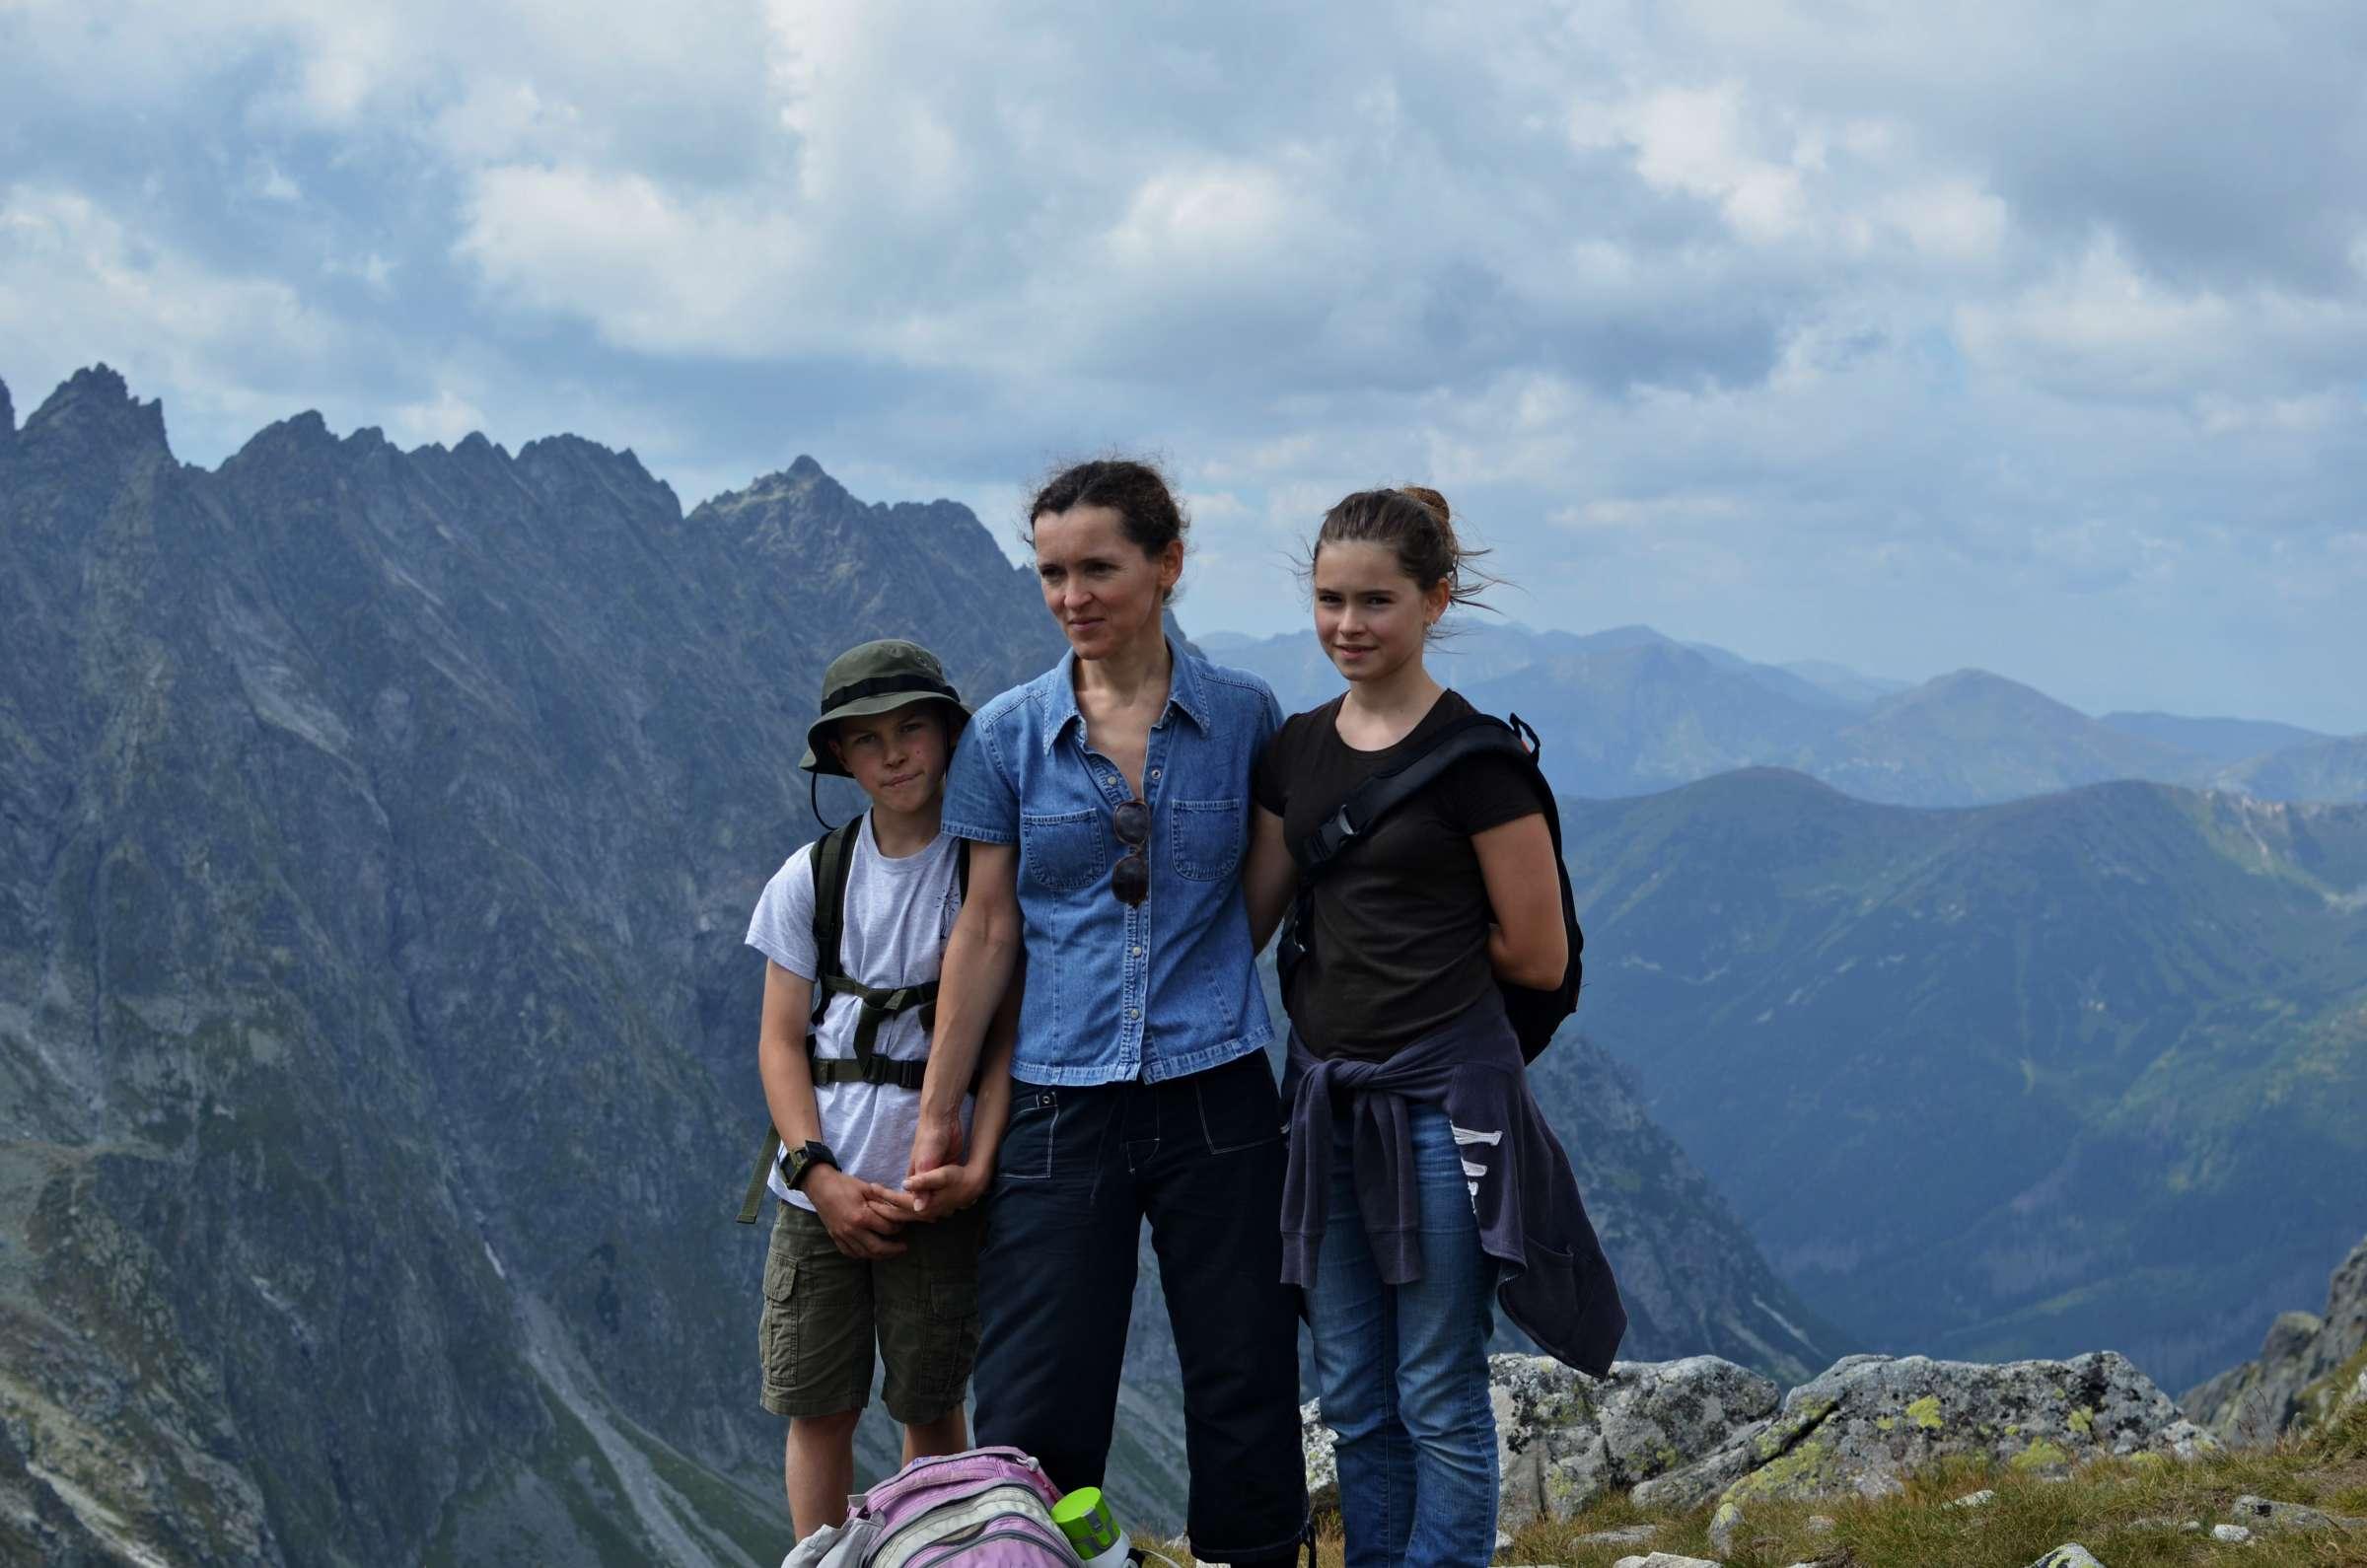 Kôprovský Peak